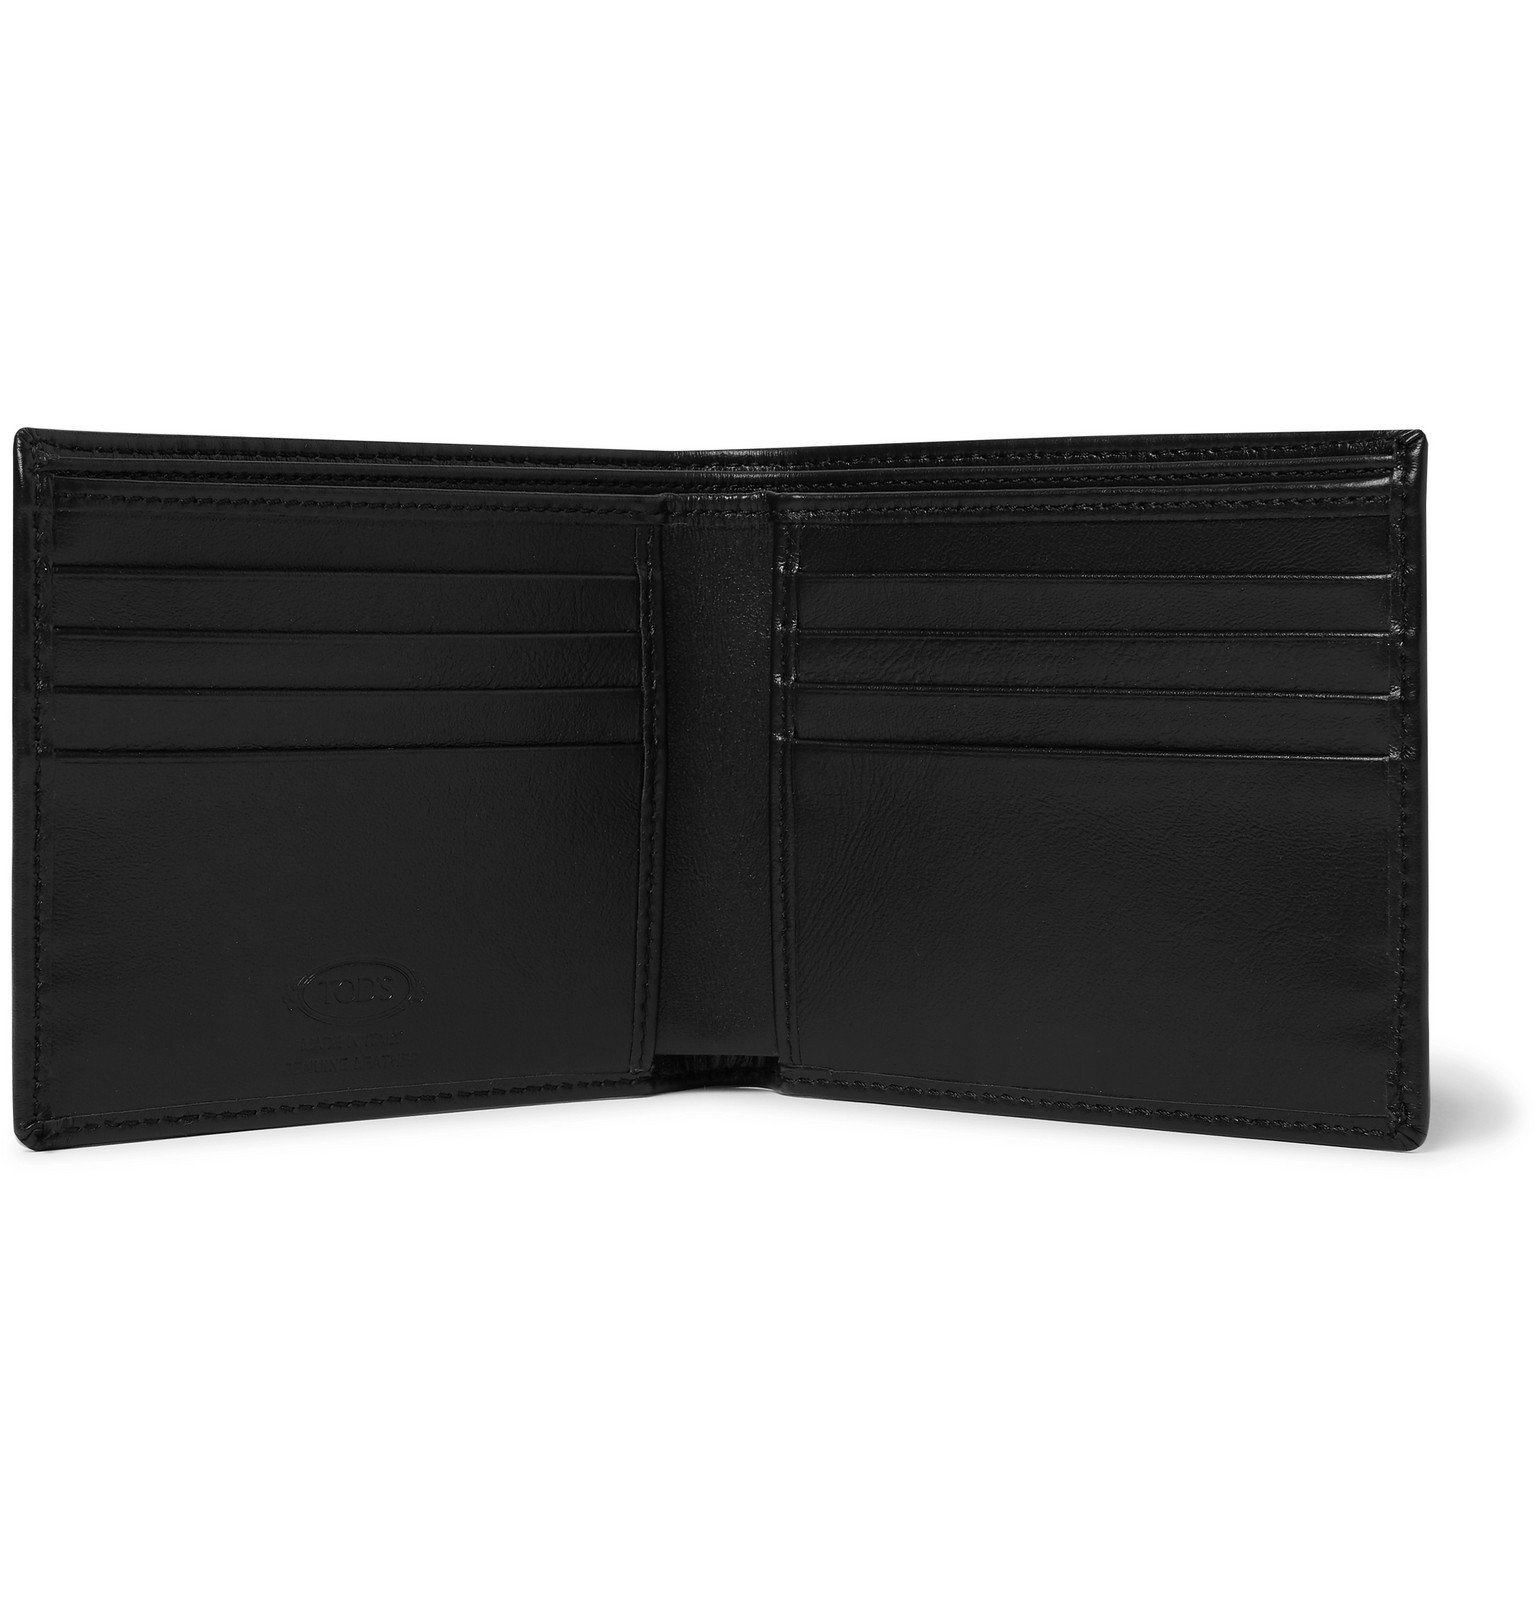 Tod's - Leather Billfold Wallet - Black